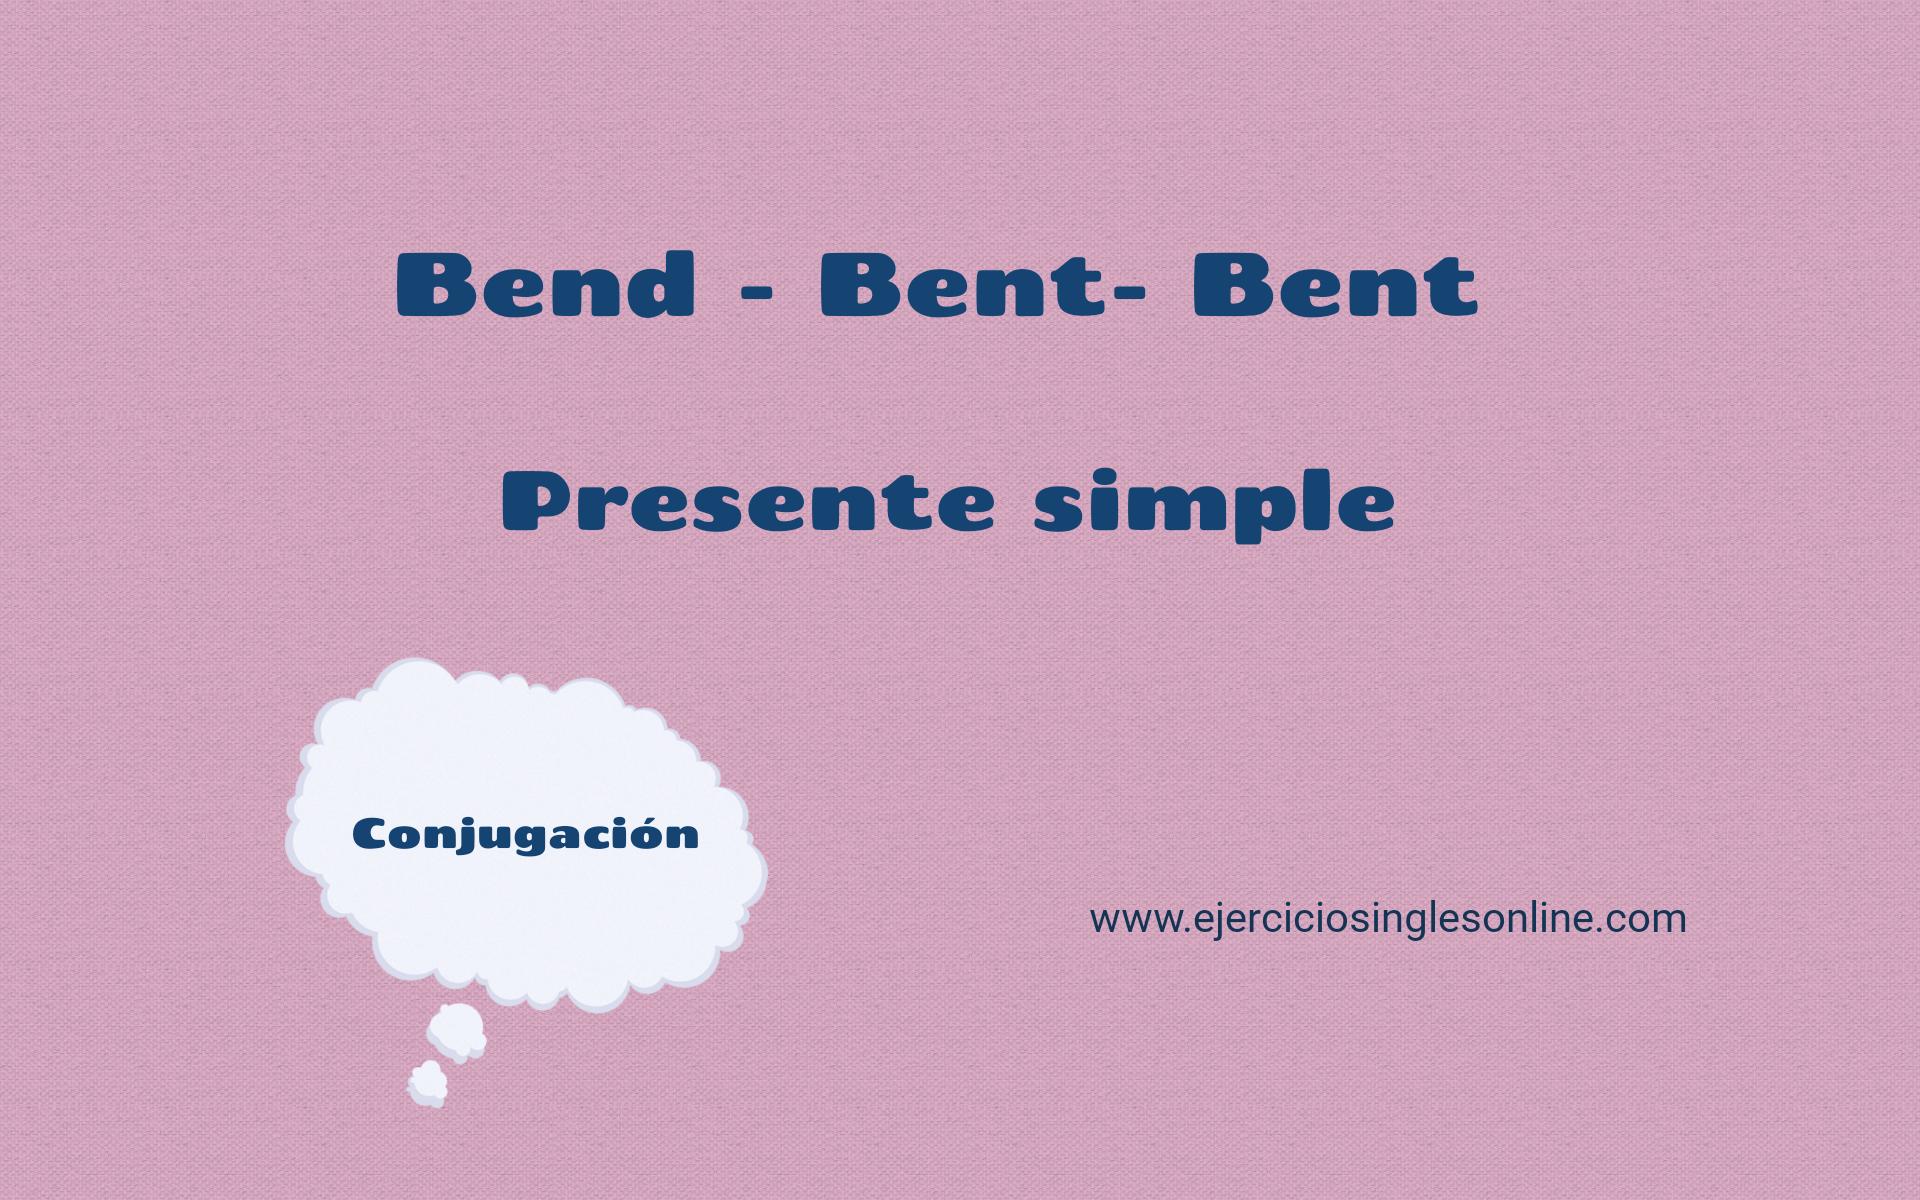 Bend - Presente simple